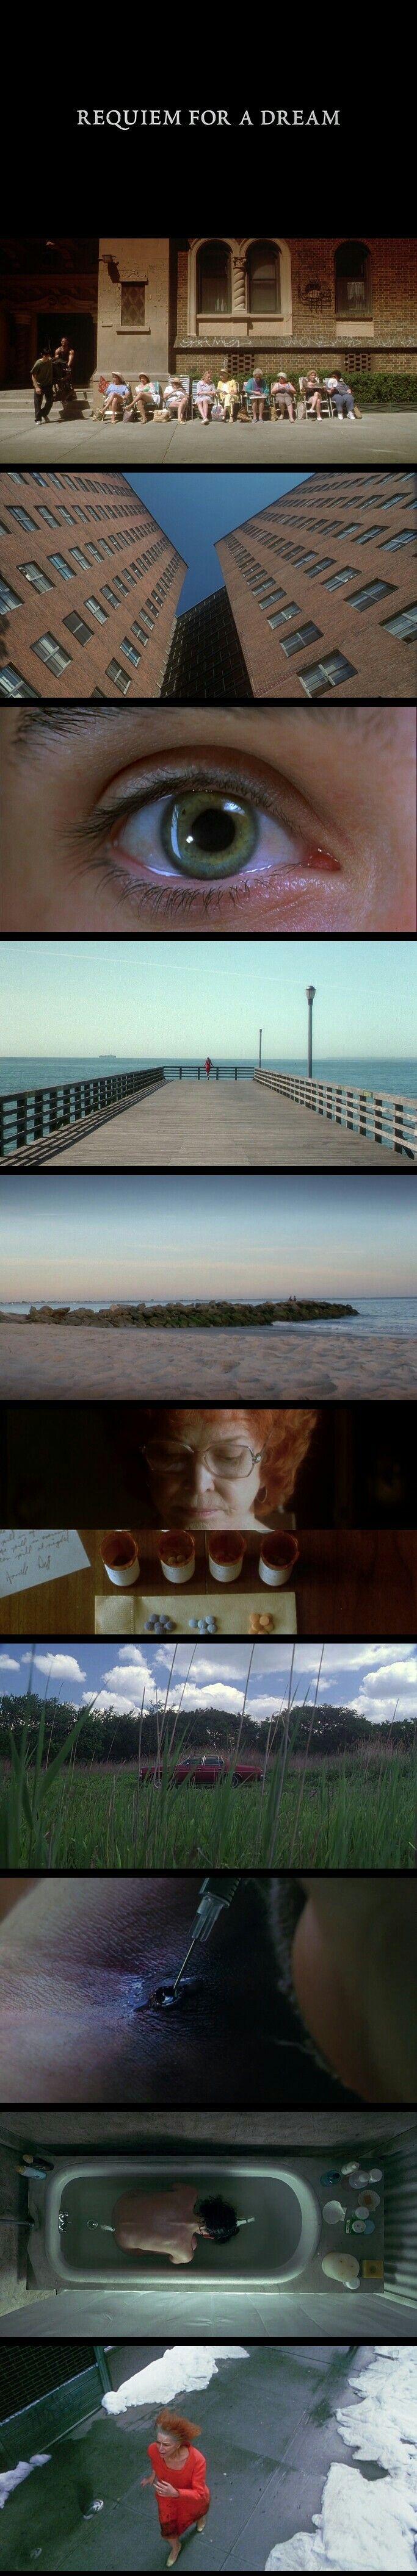 Requiem for a Dream(2000) Directed by Darren Aronofsky. Cinematogrphy by Matthew Libatique.